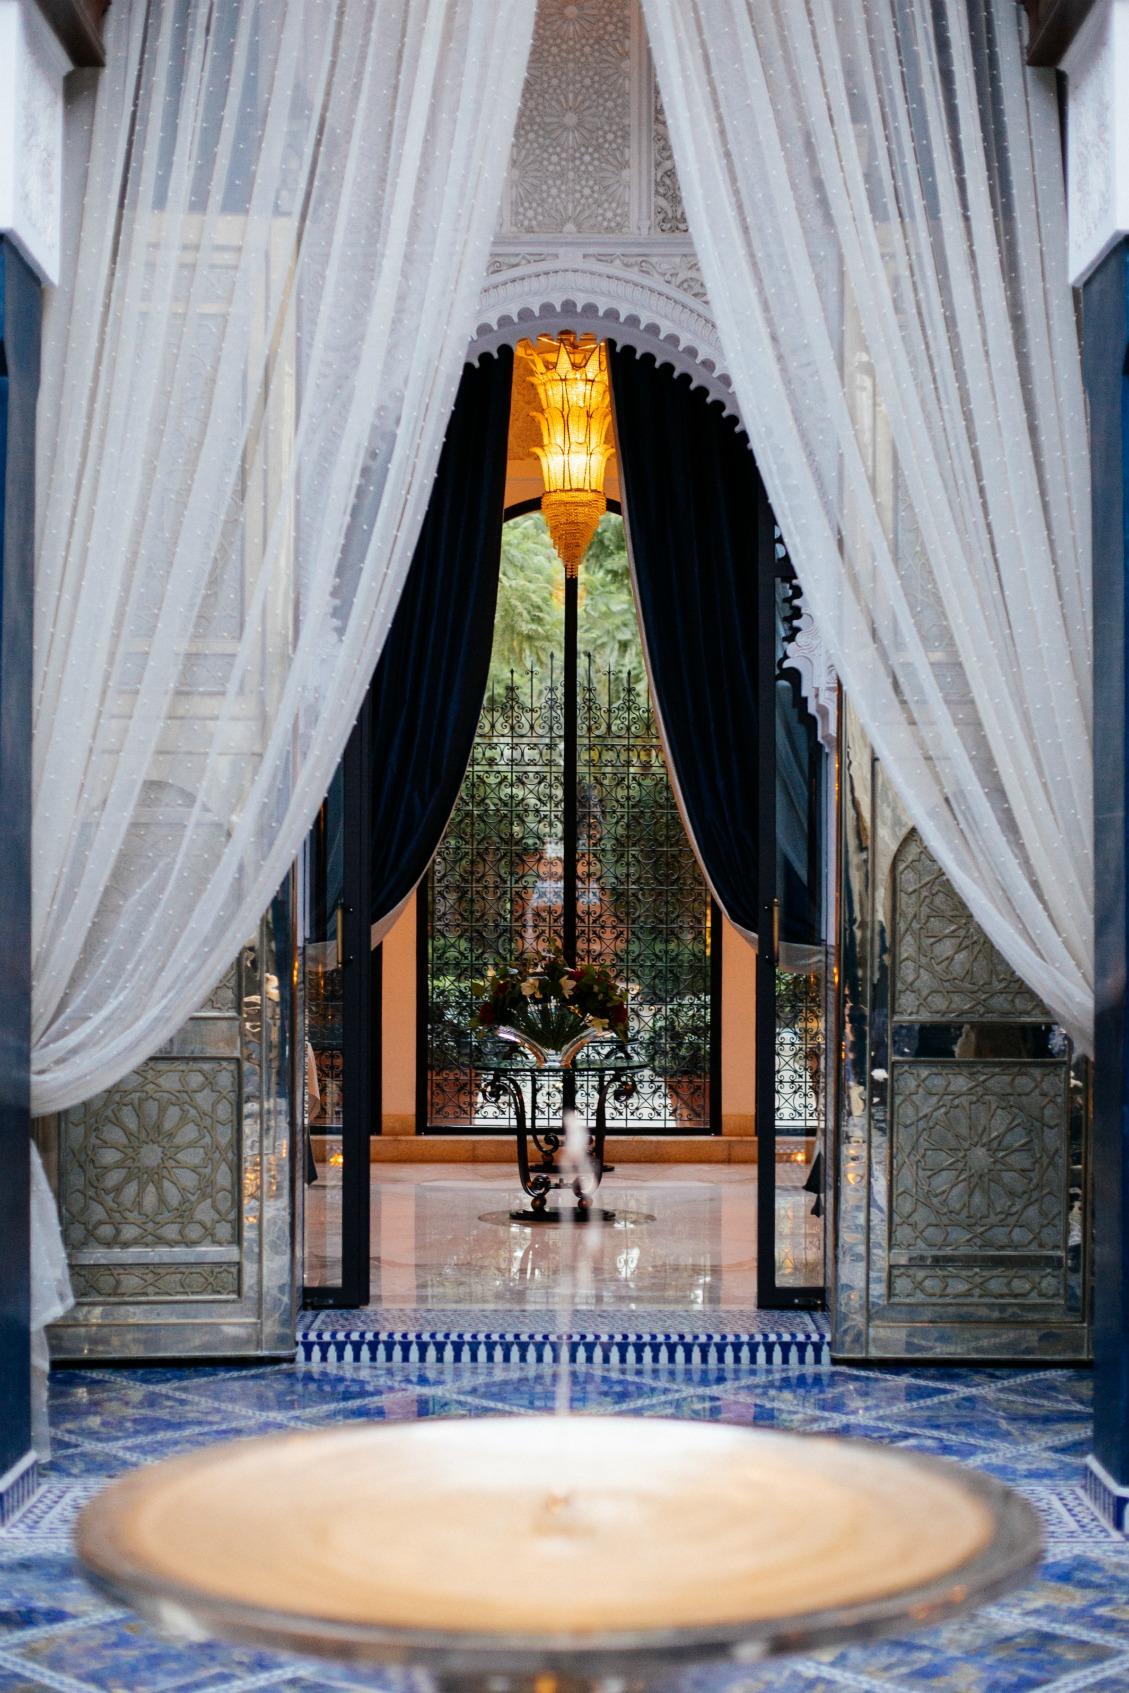 royal-mansour-hotel-luxury-marrakesch-marrakesh-morocco-edisa-shahini-disicouture-blog-51